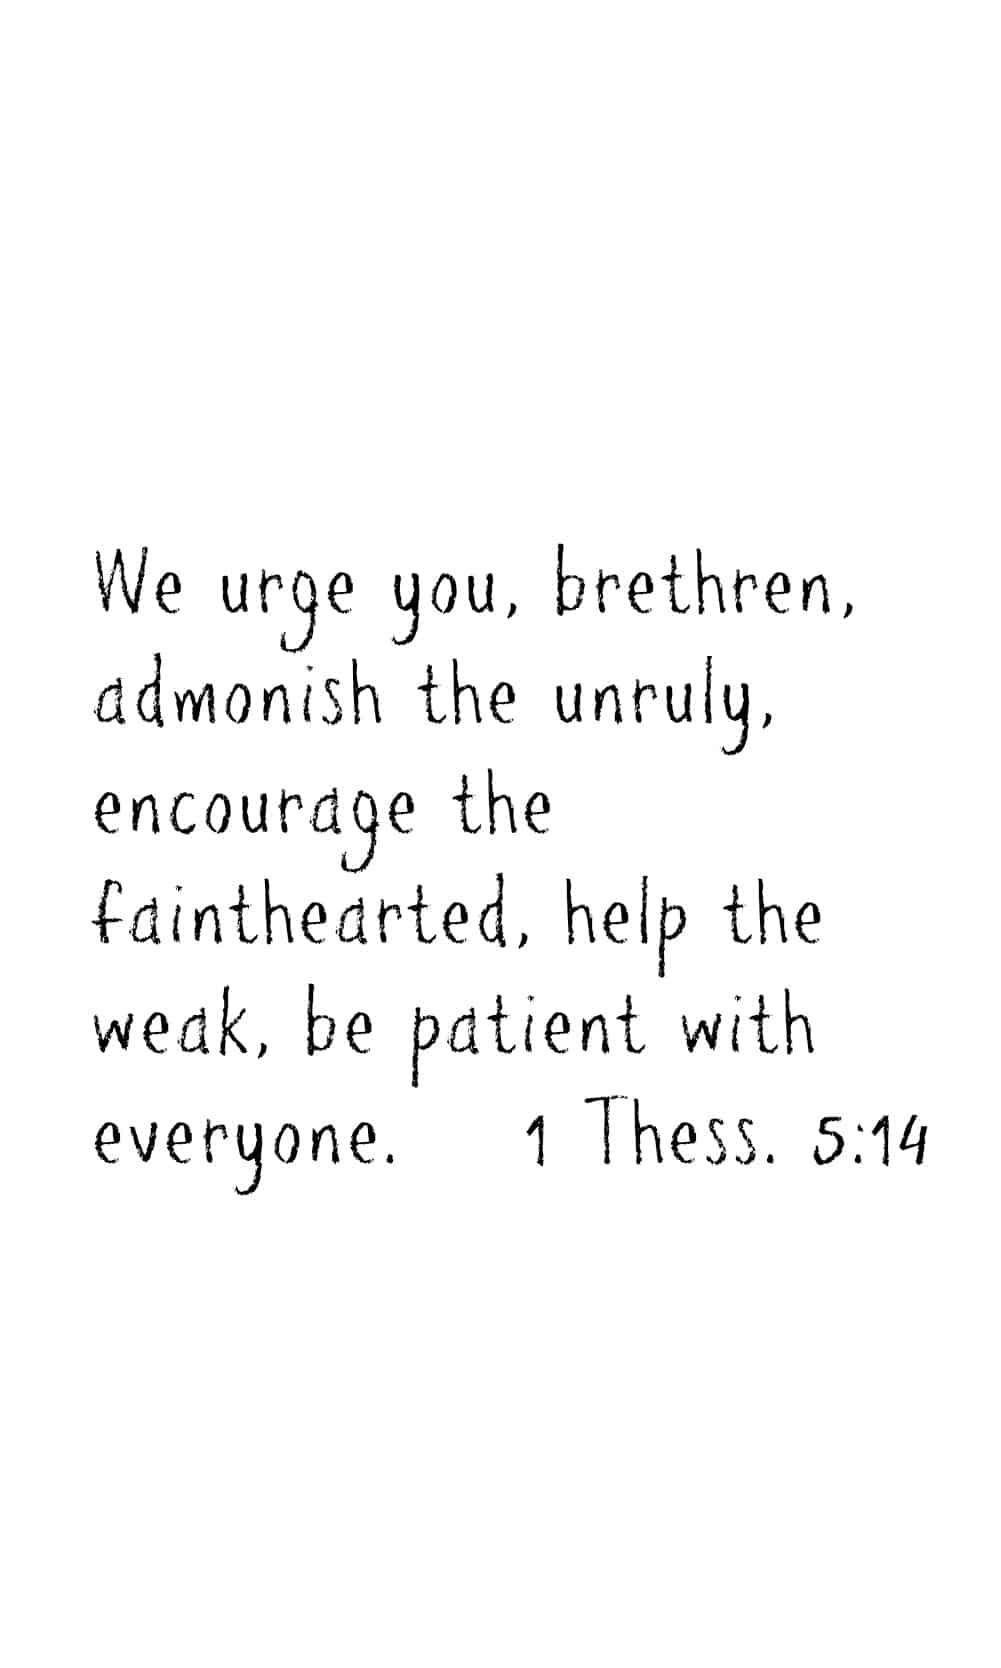 iPhone Scripture Memory Wallpaper | 1 Thessalonians 5:14